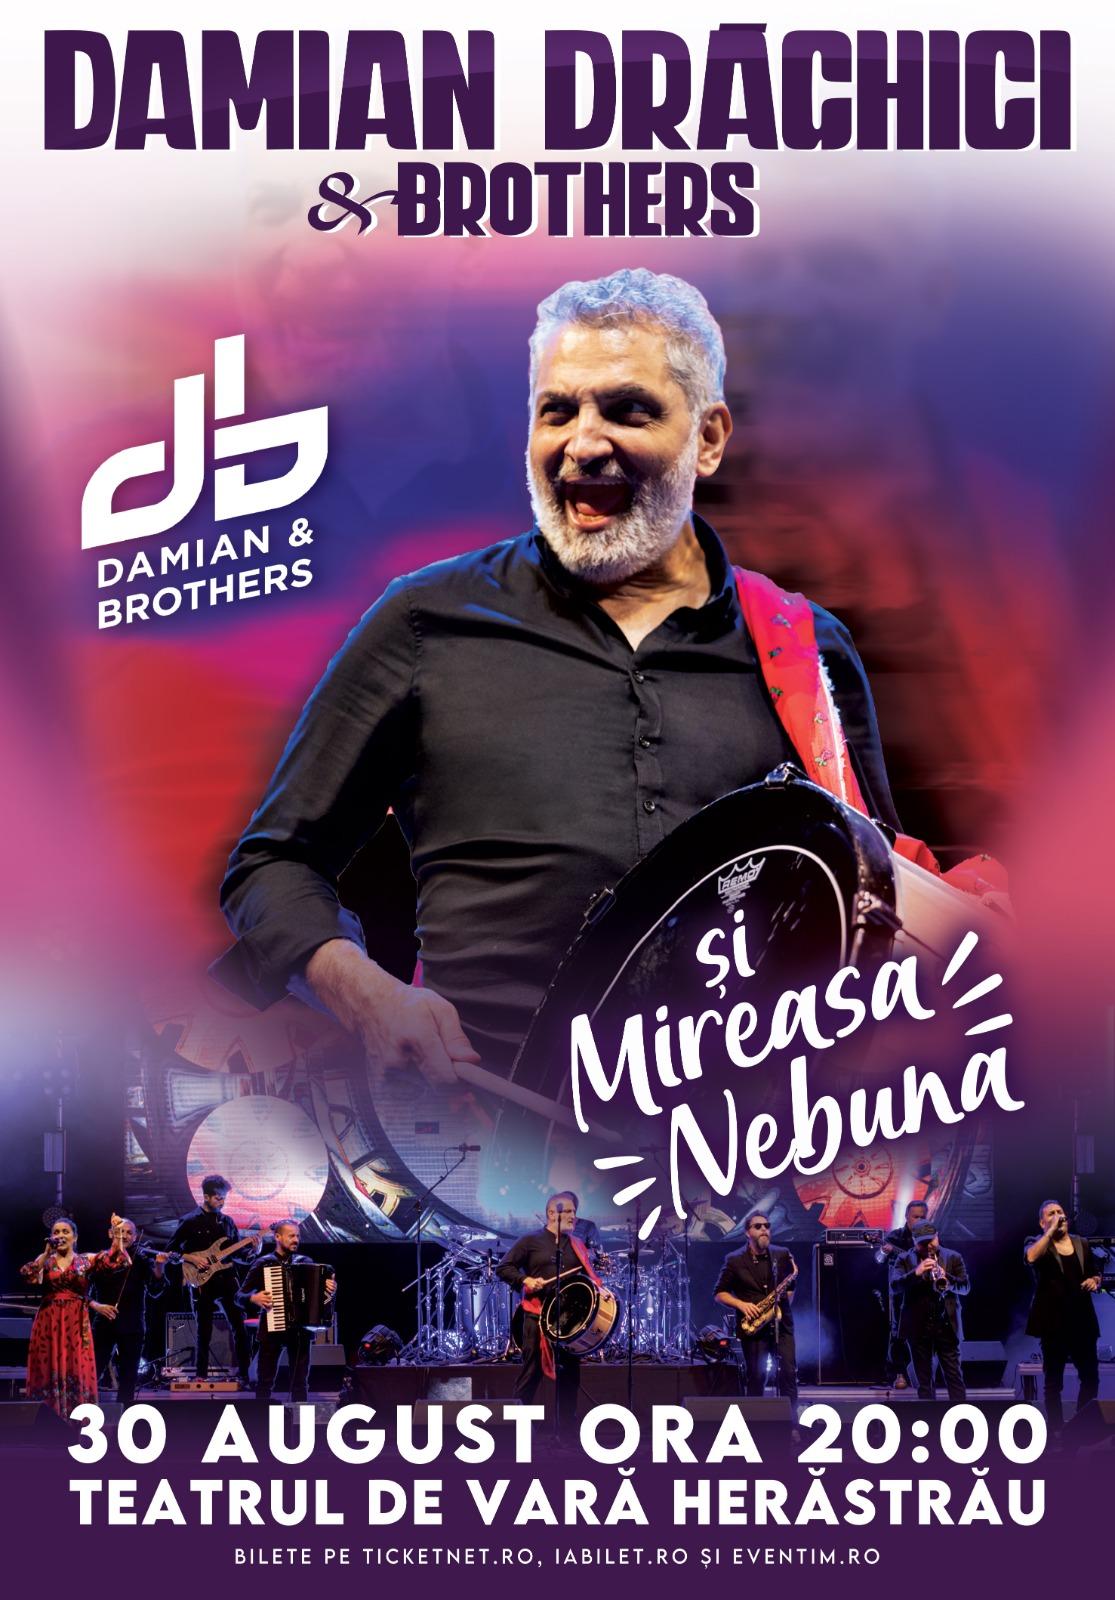 Damian Drăghici & Brothers - Mireasa nebună